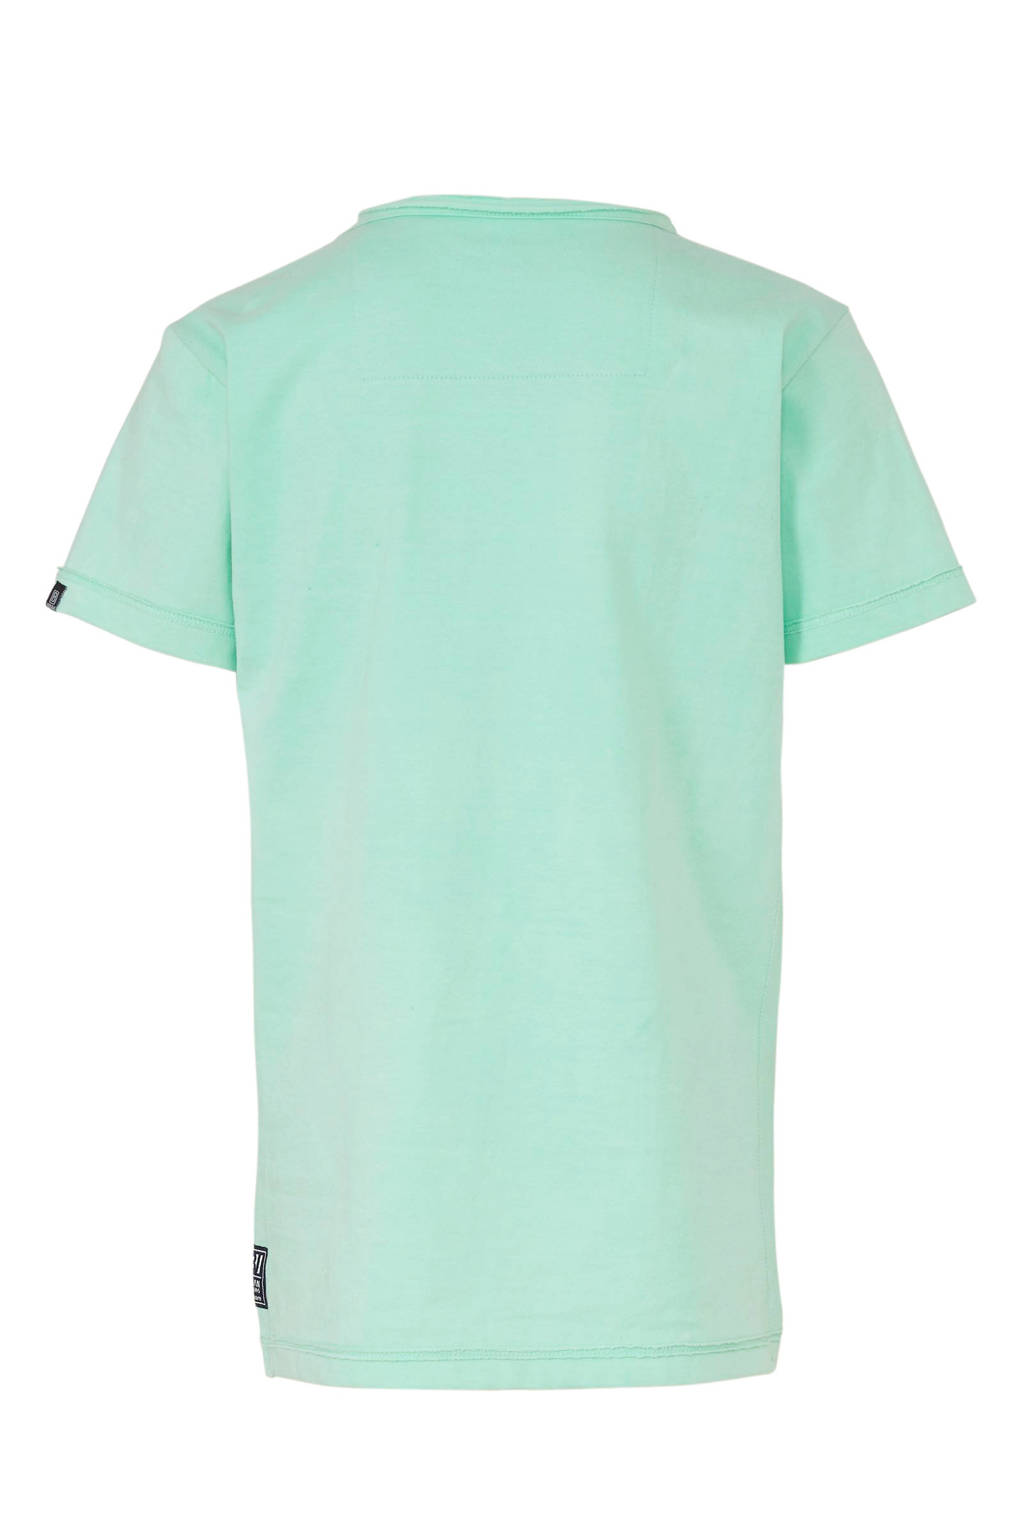 Indian Blue Jeans T-shirt met tekst mintgroen/donkerblauw, Mintgroen/donkerblauw